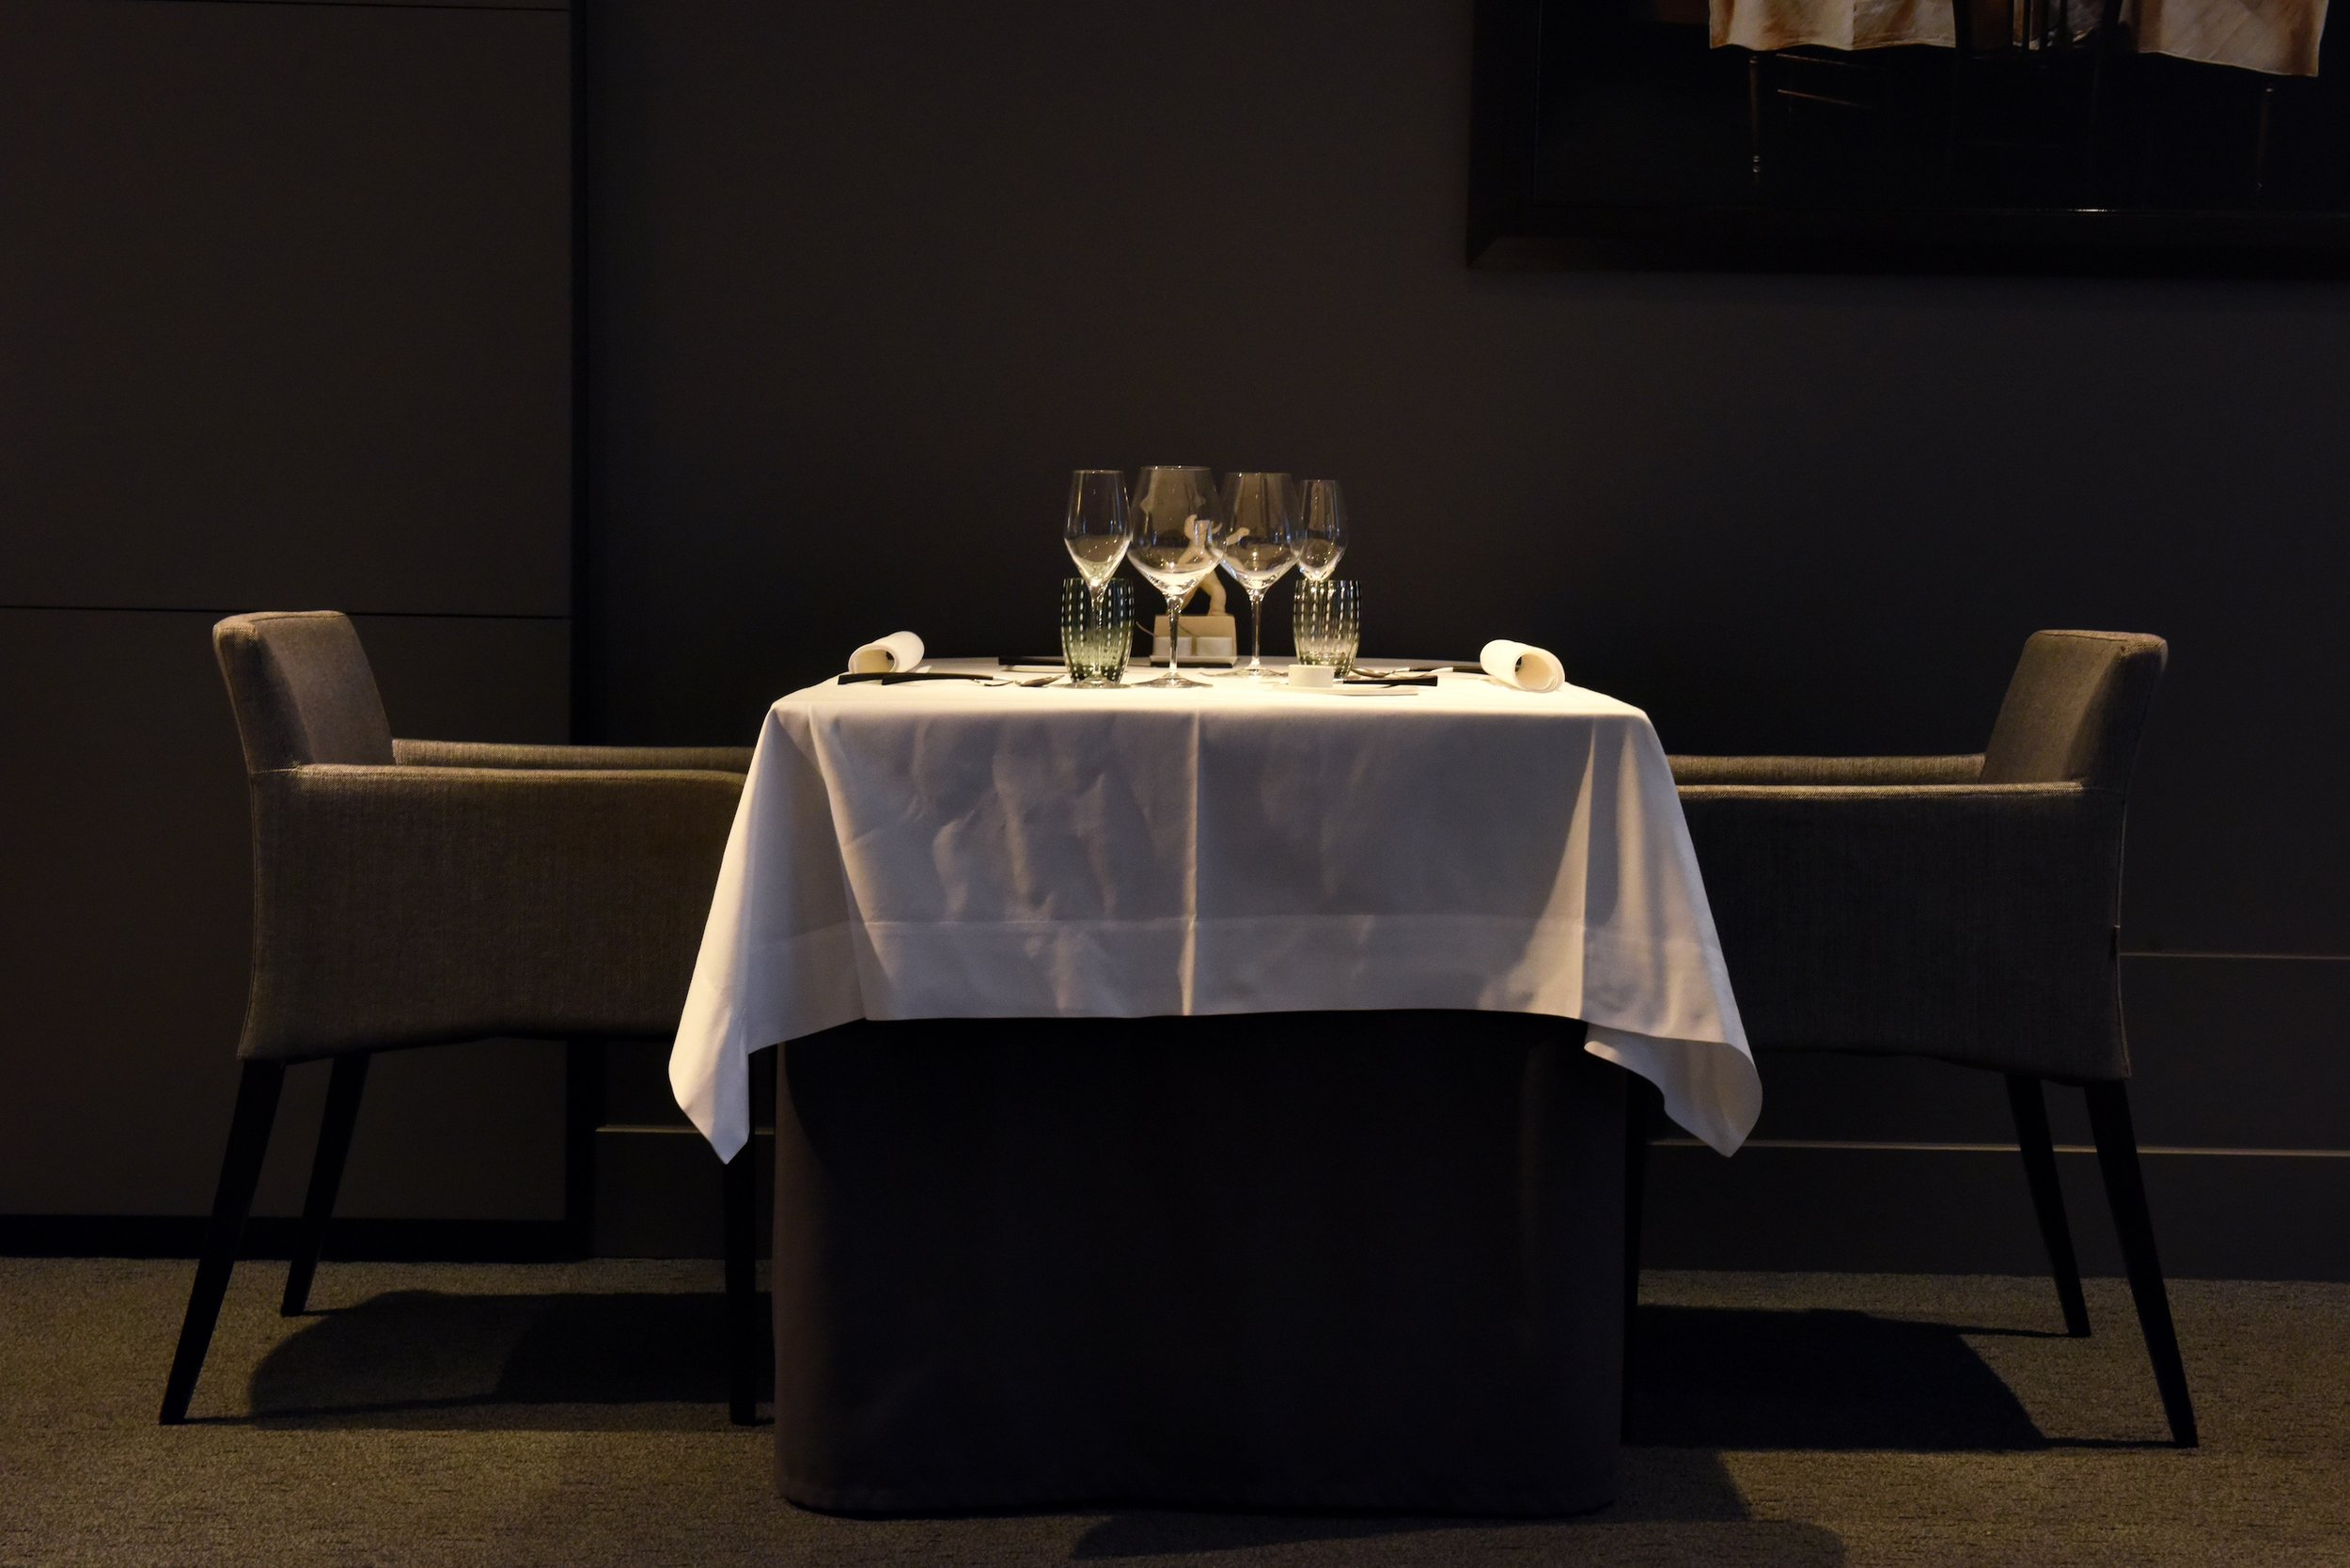 23 arenberg fotograaf restaurant michelin bart albrecht tablefever everlee Egenhoven 0007.jpg